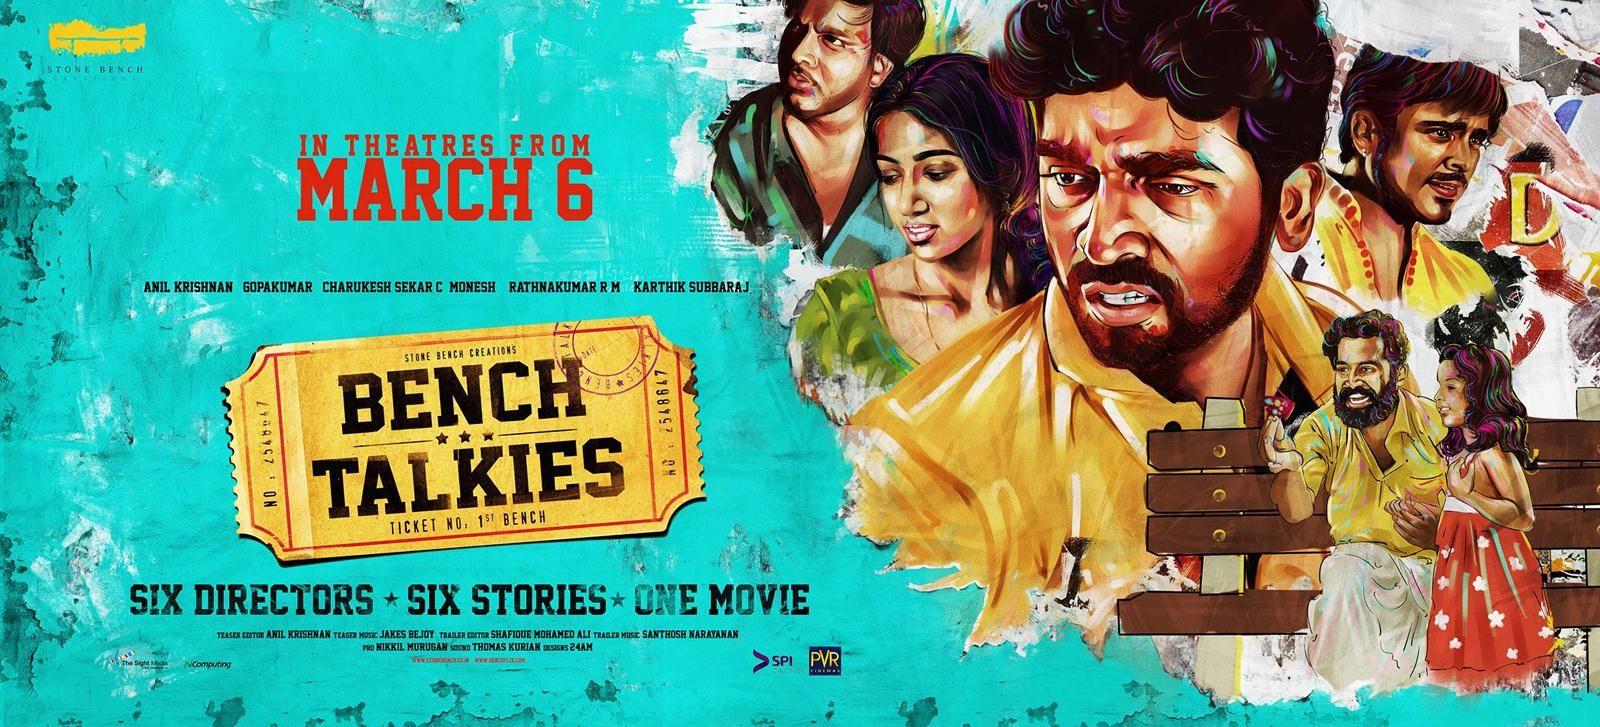 thola tamil movie online